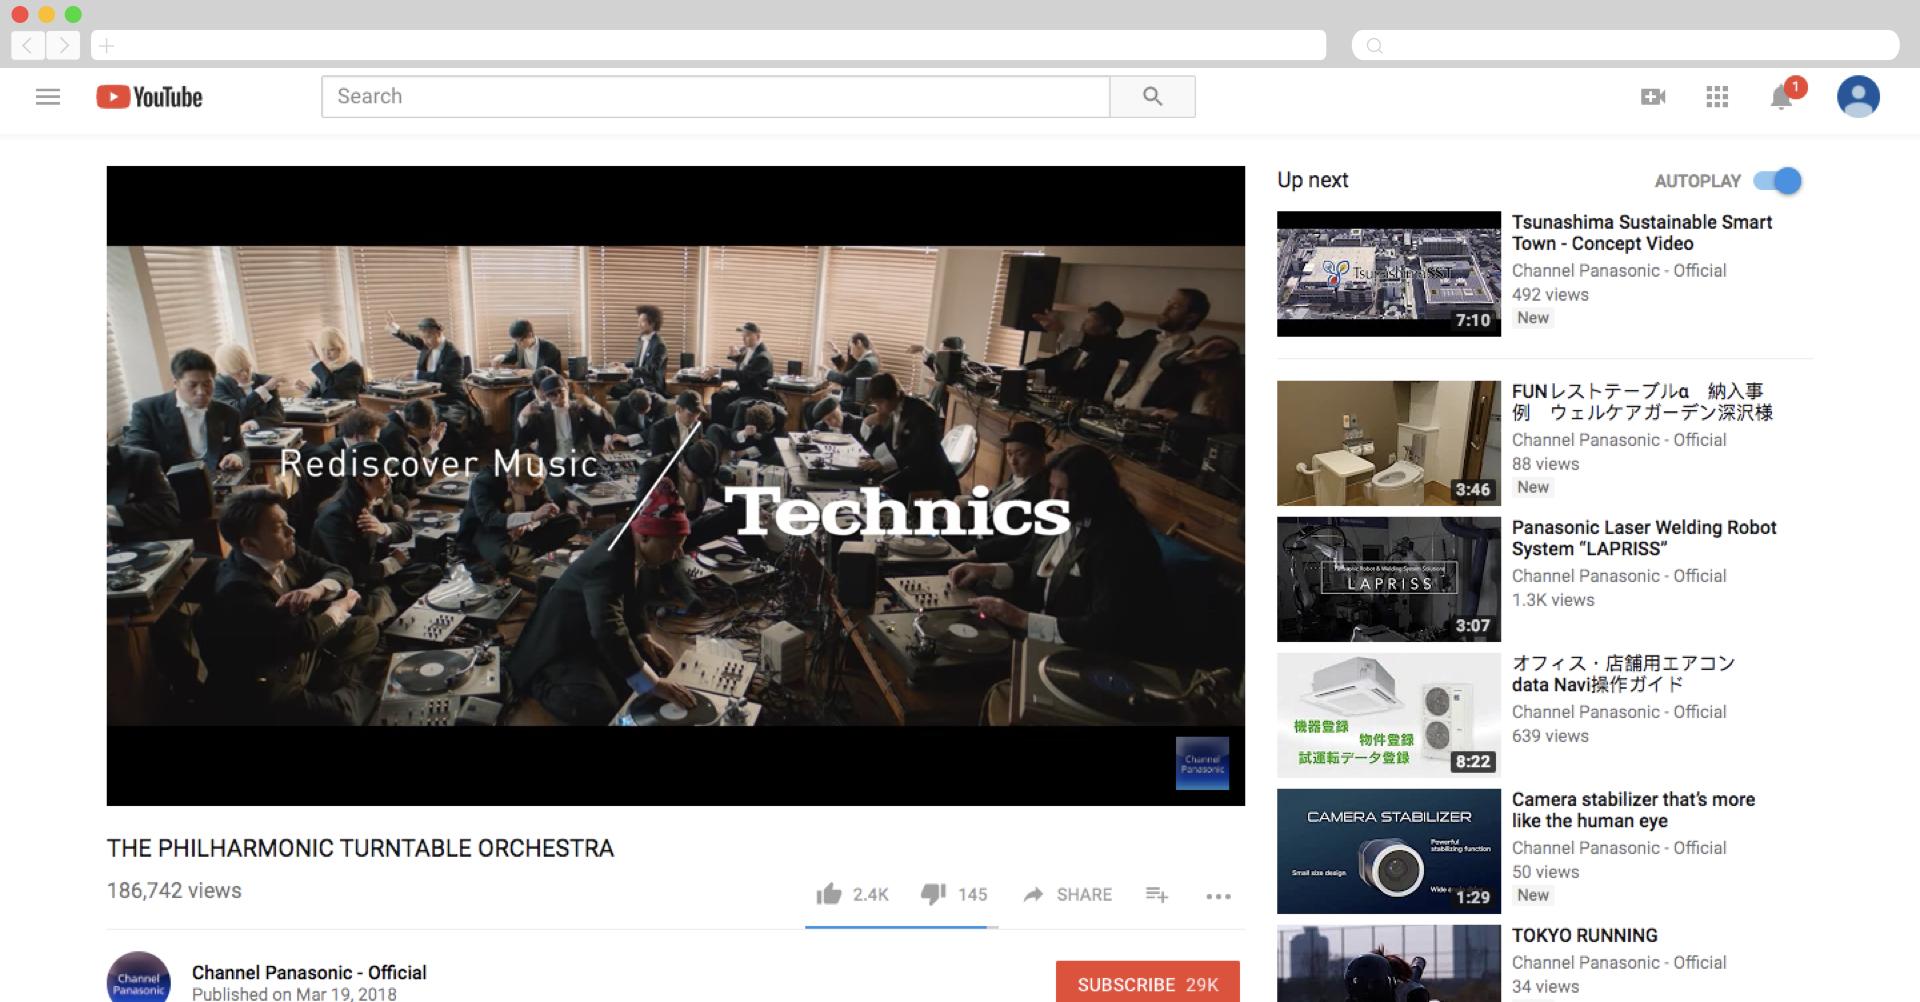 Technics - Philharmonic Turntable Orchestra